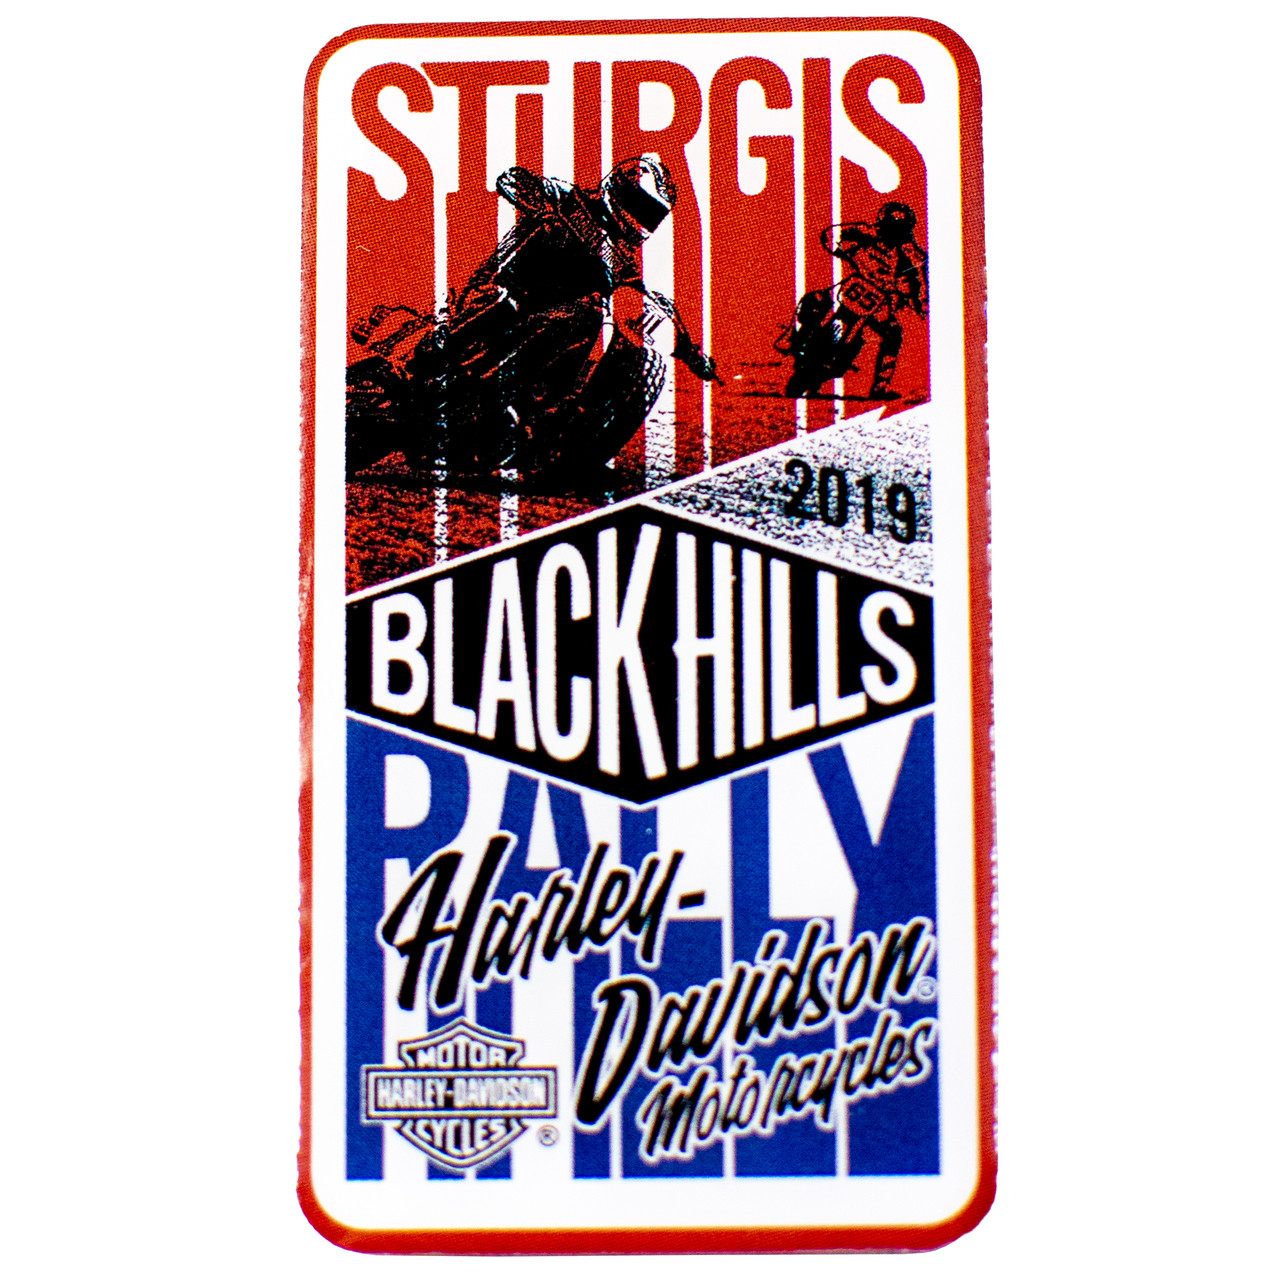 2019 Sturgis Harley-Davidson 79th Rally Pin